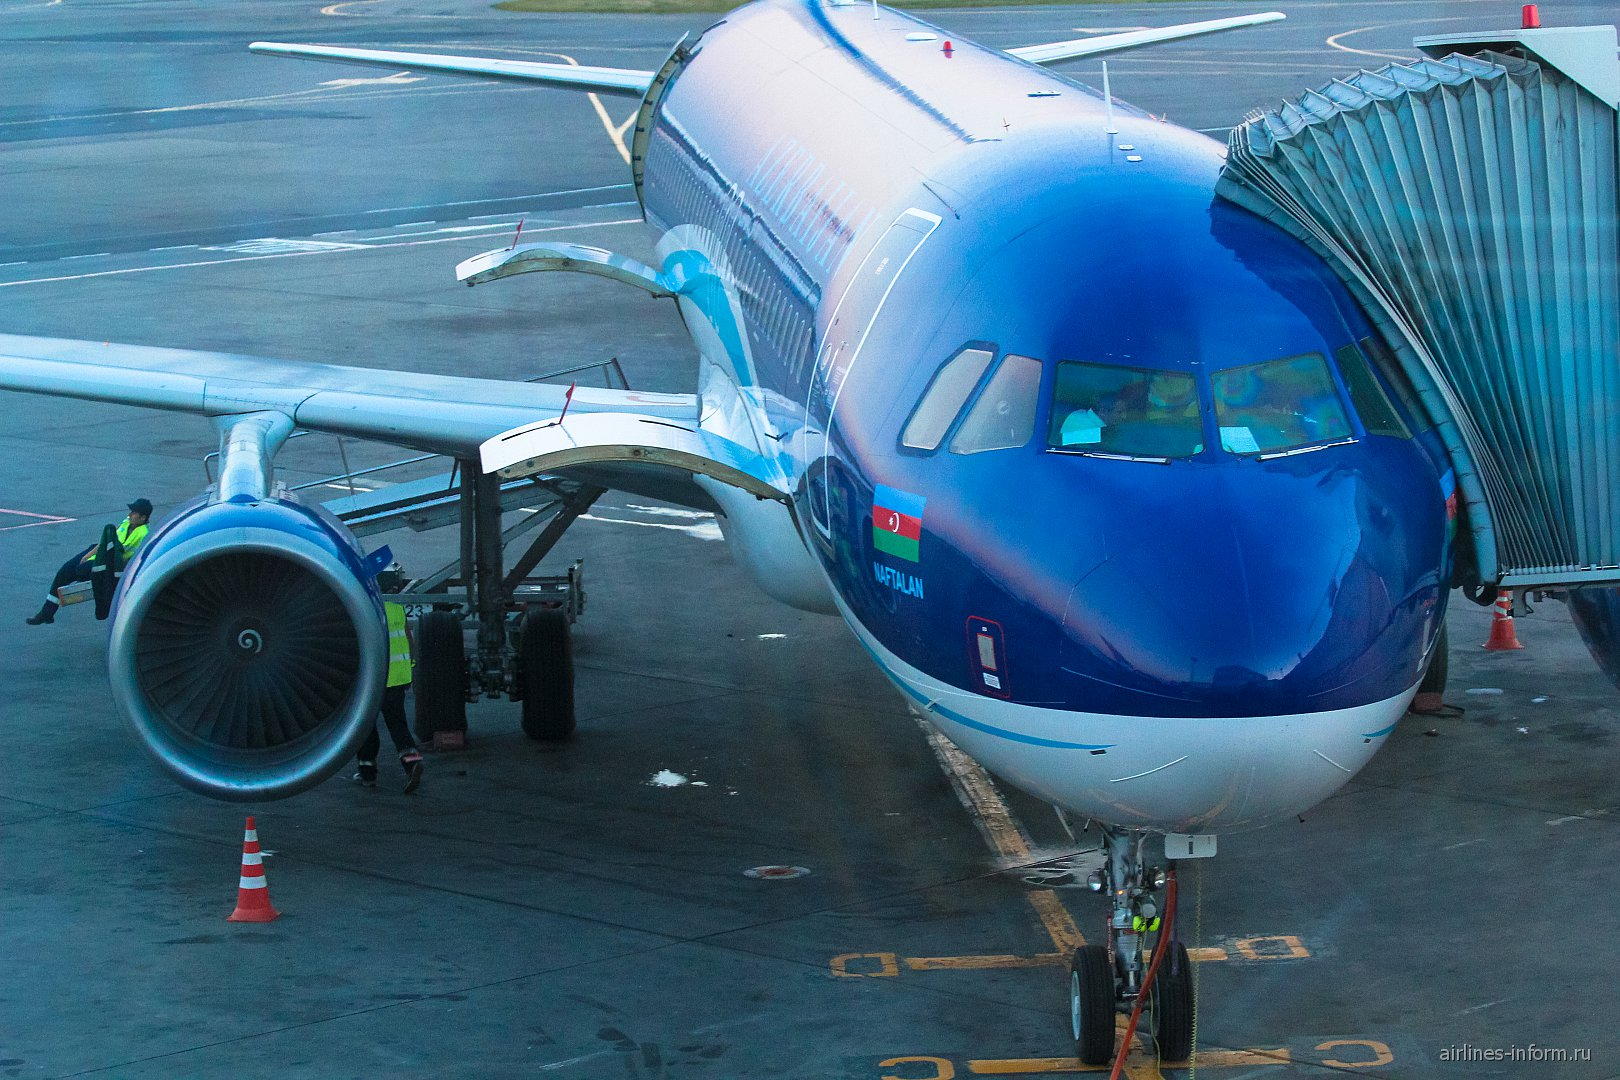 Airbus A320 Азербайджанских авиалиний в аэропорту Домодедово